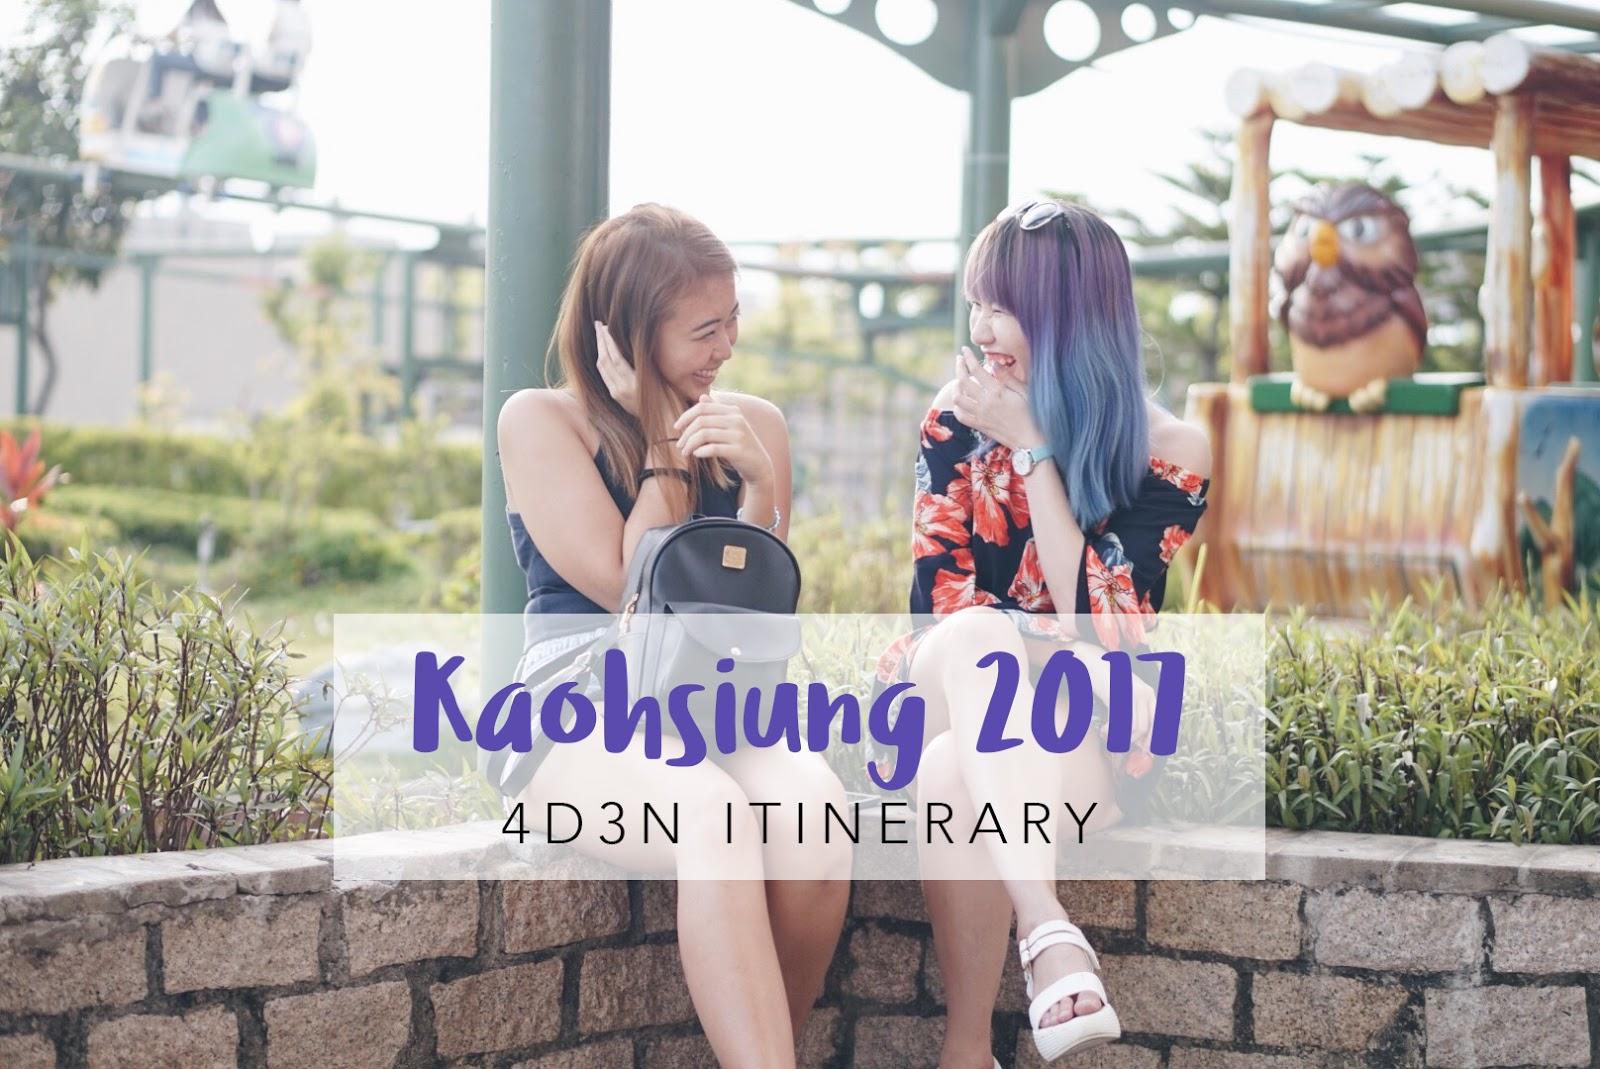 4D3N Kaohsiung 2017 Itinerary | PEKYJ TRAVEL BLOG SINGAPORE